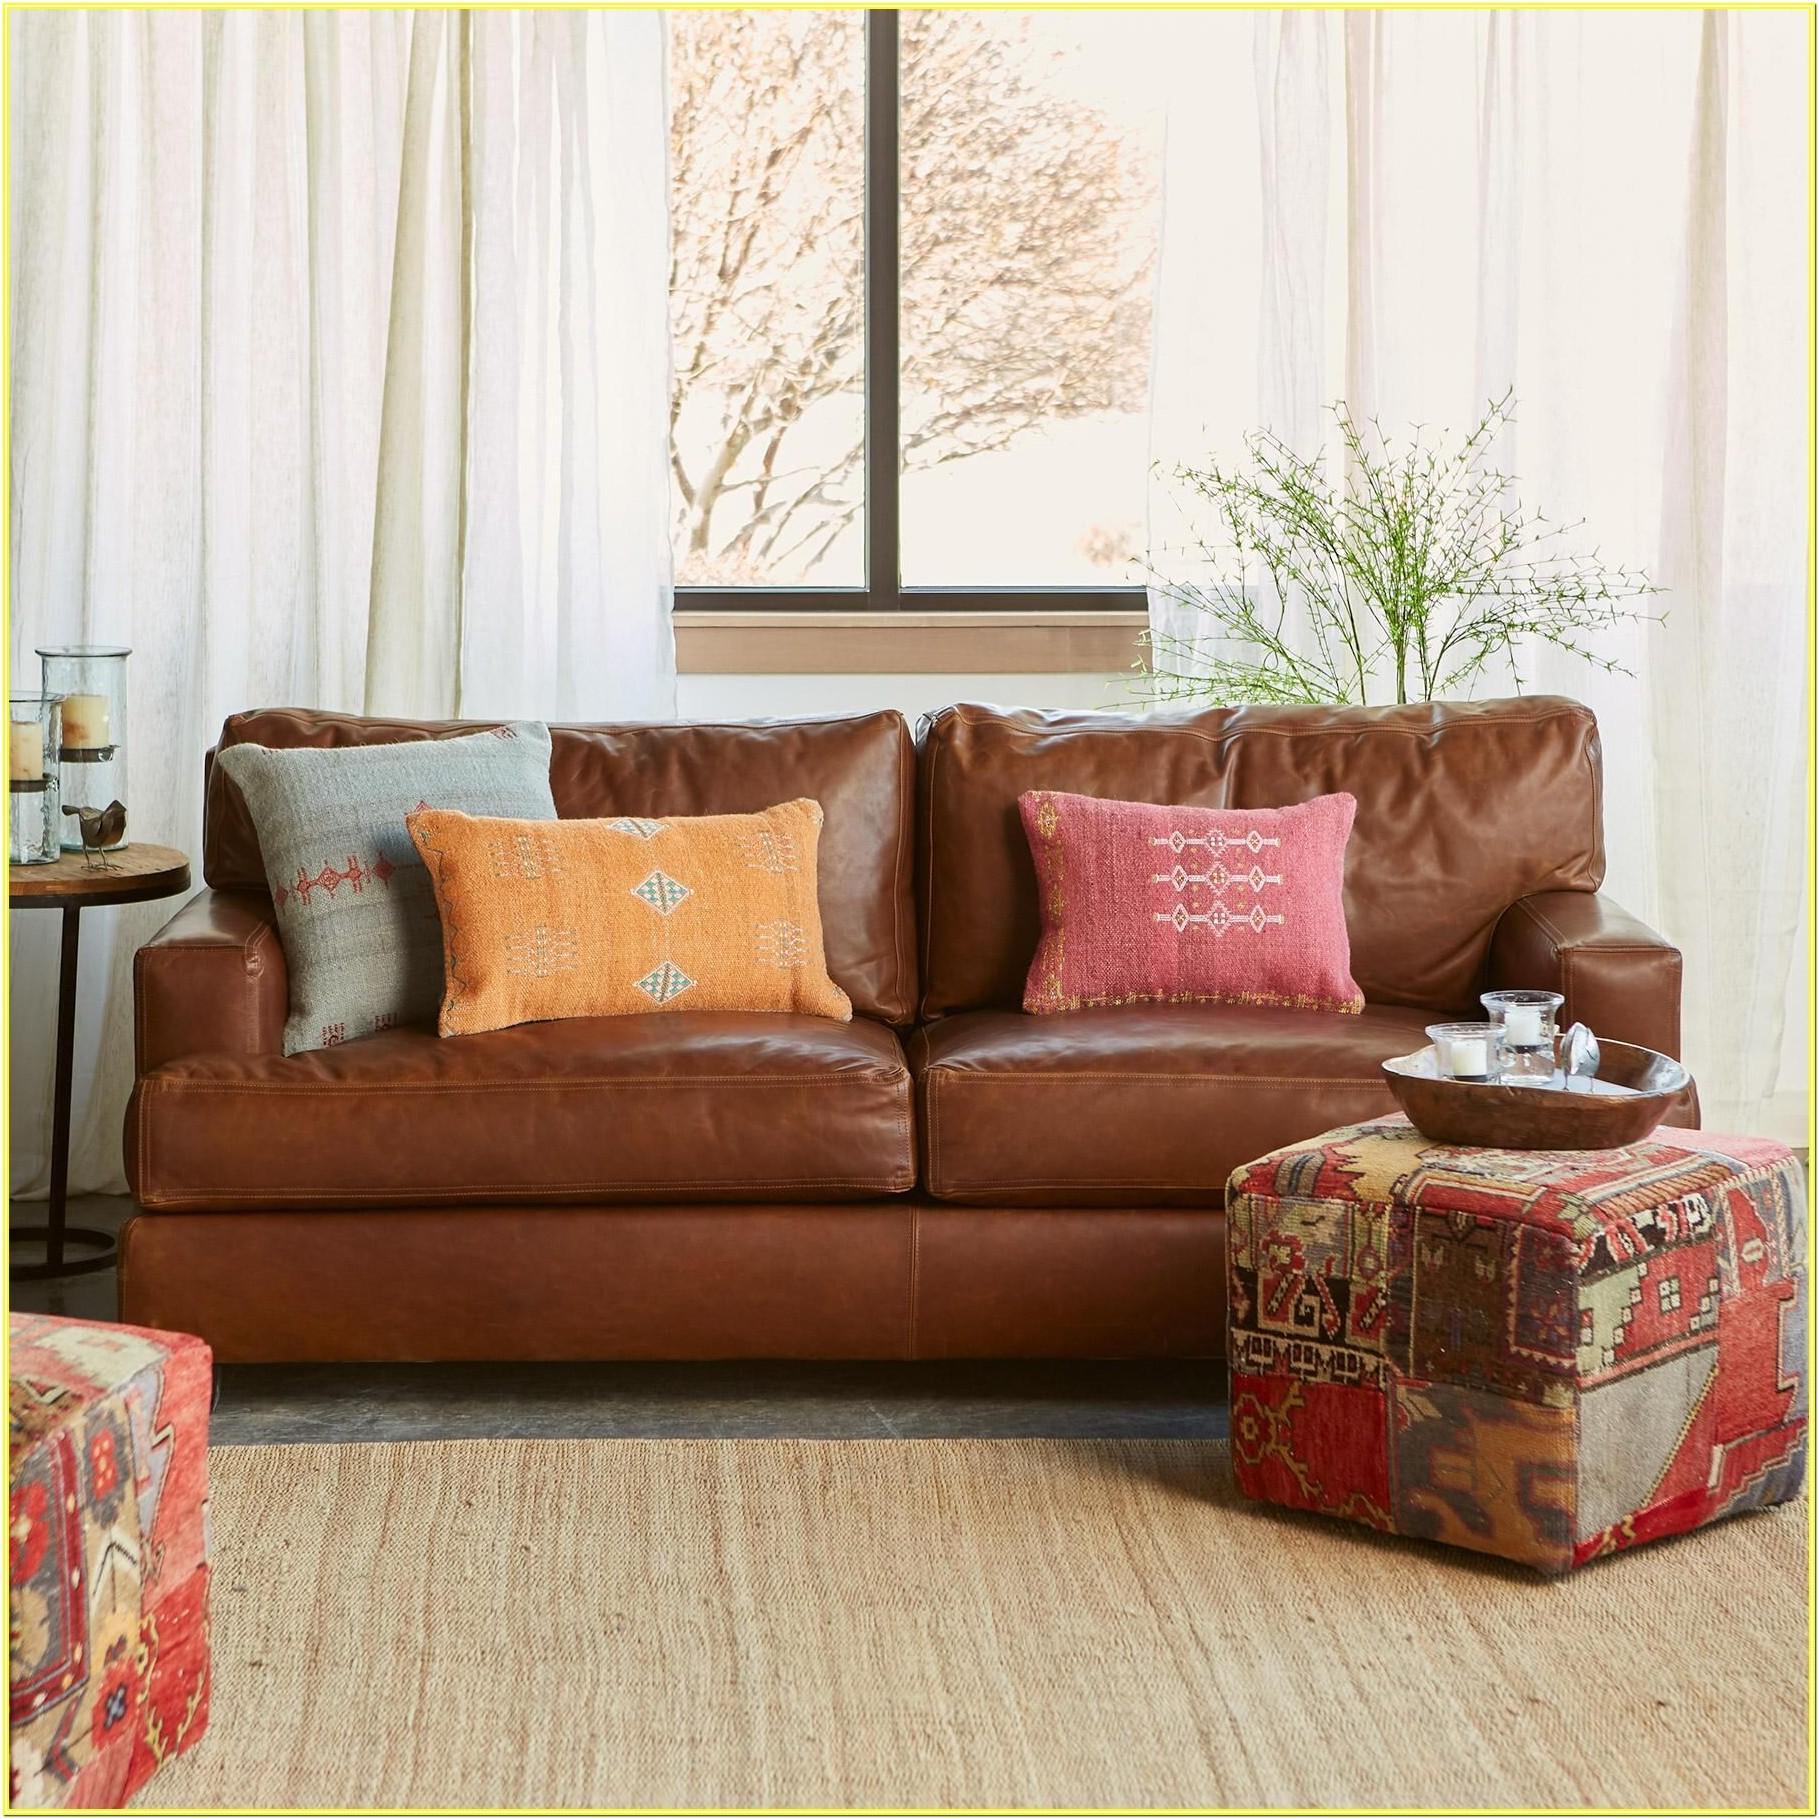 Comfortable Sofas For Living Room